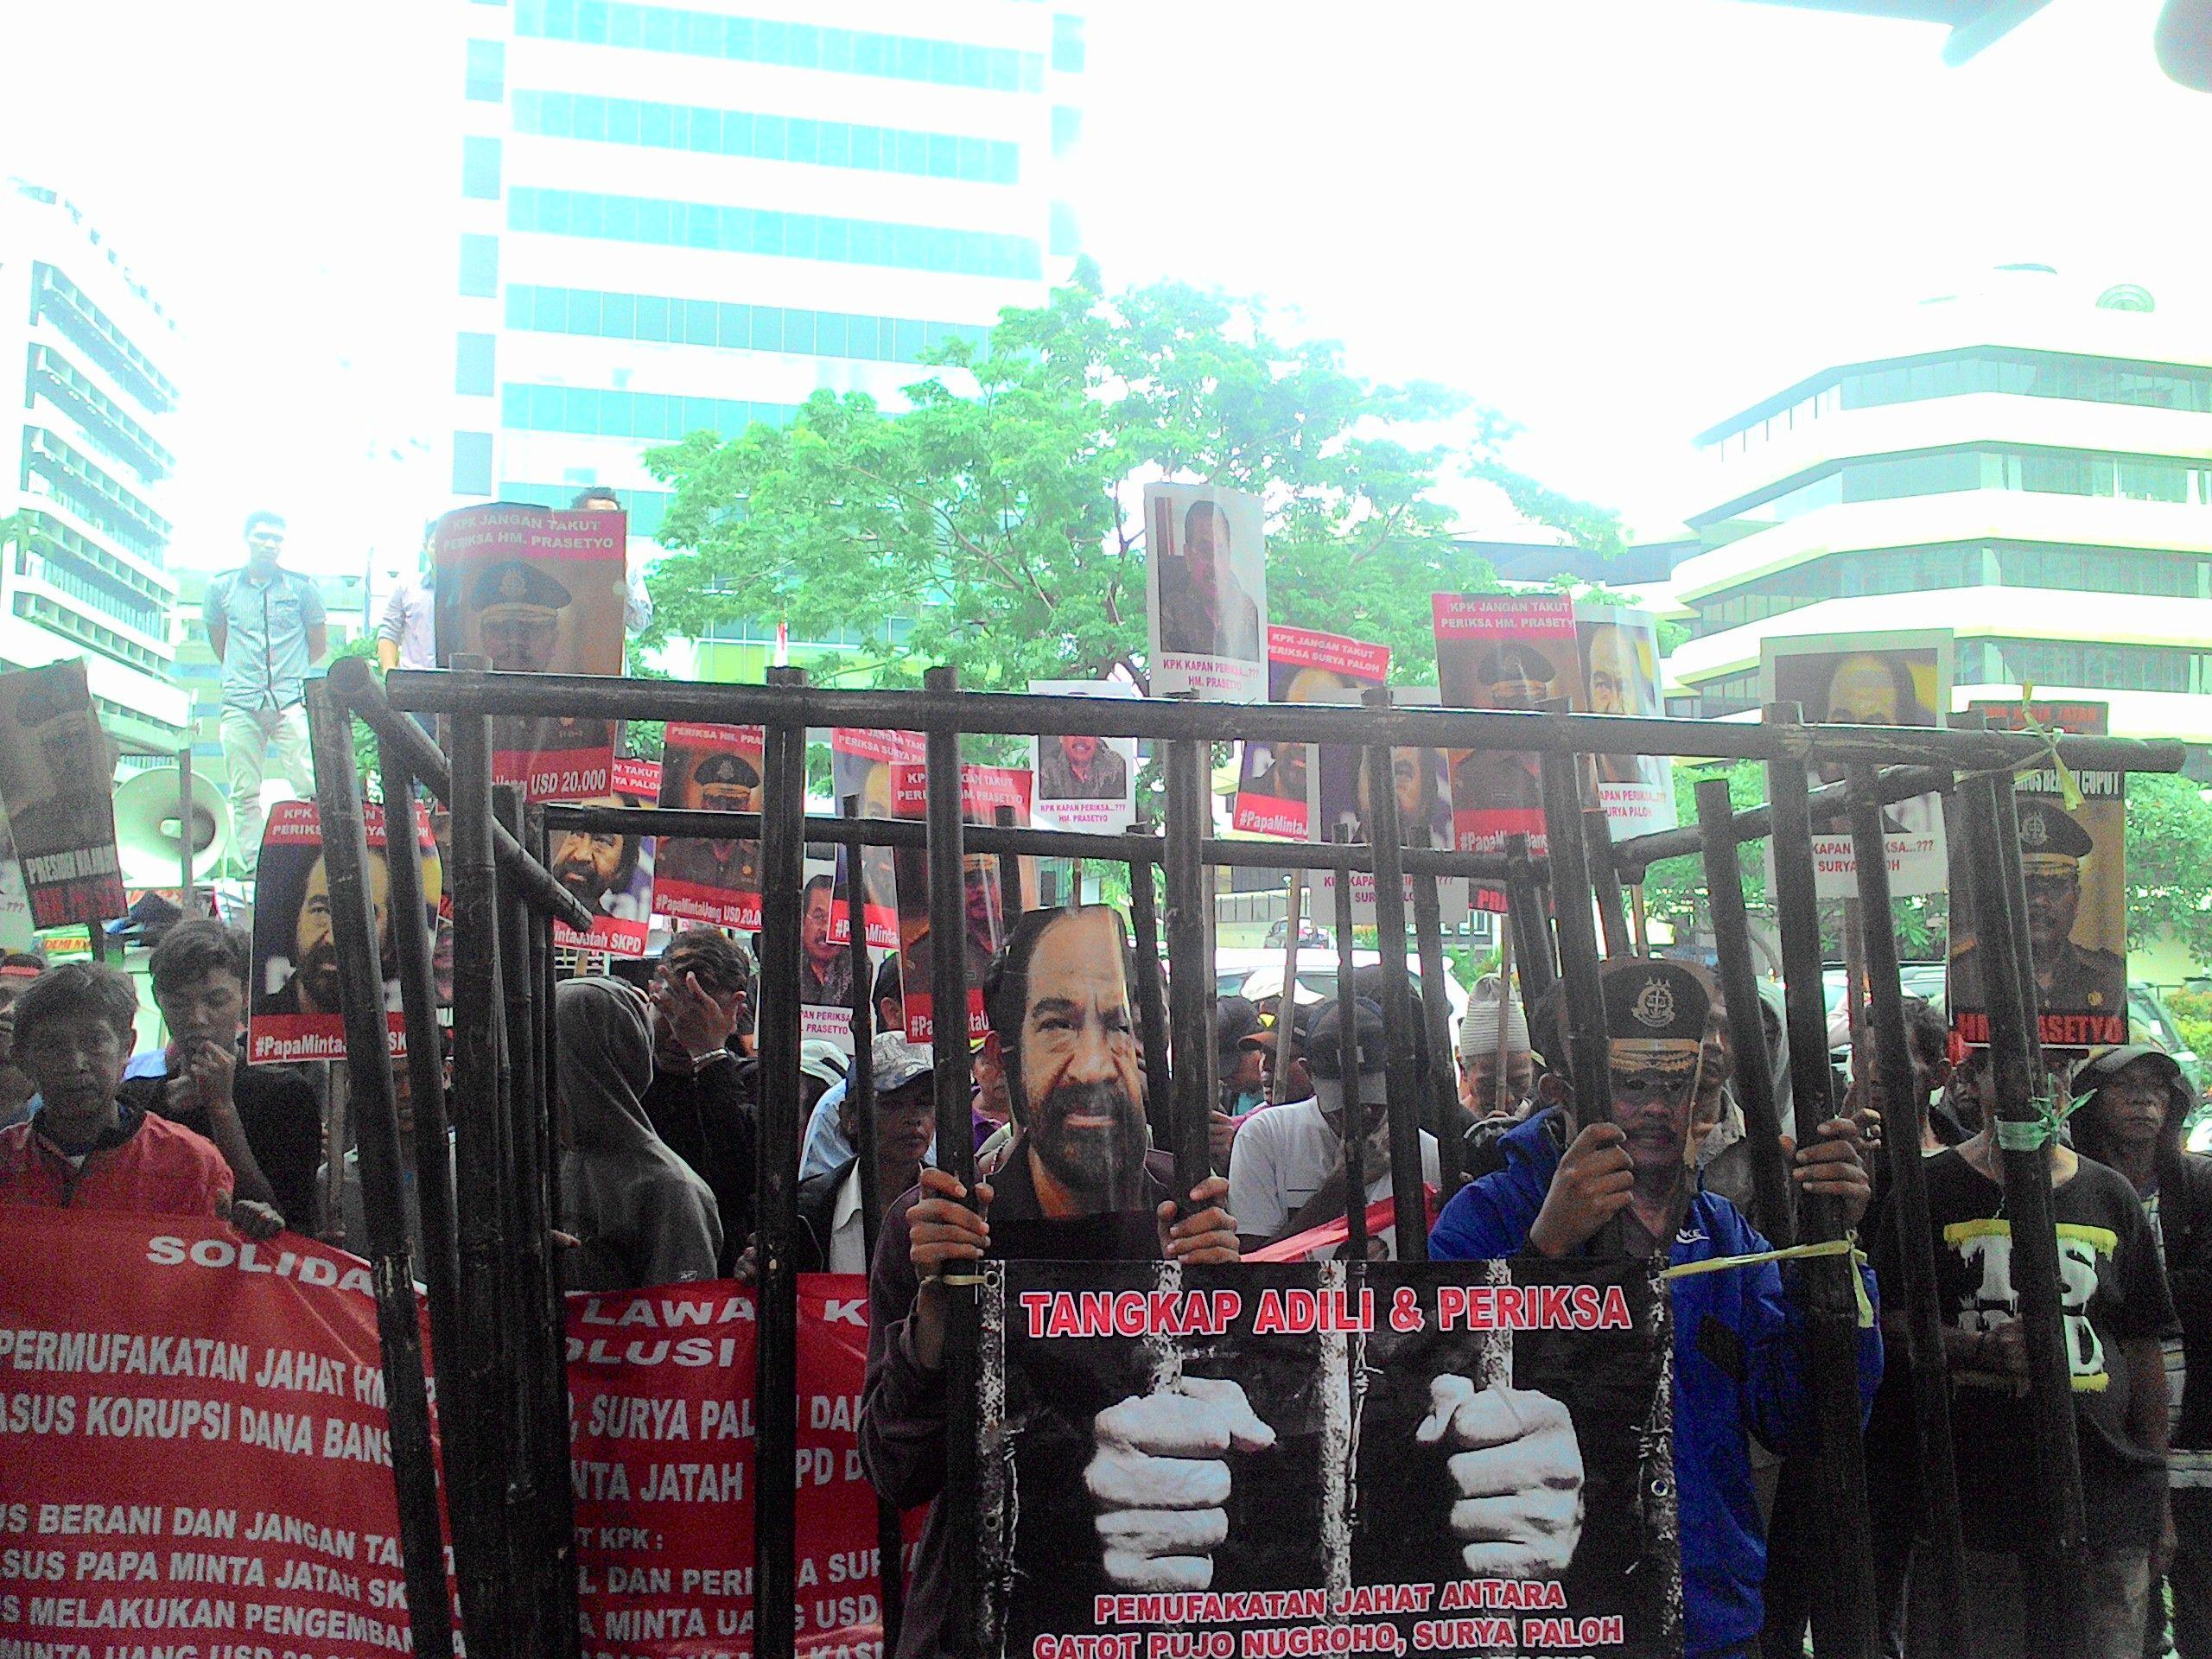 https://img.okezone.com/content/2016/01/25/337/1296436/demo-tangkap-paloh-jaksa-agung-massa-bawa-penjara-WzFDKEHbSE.jpg